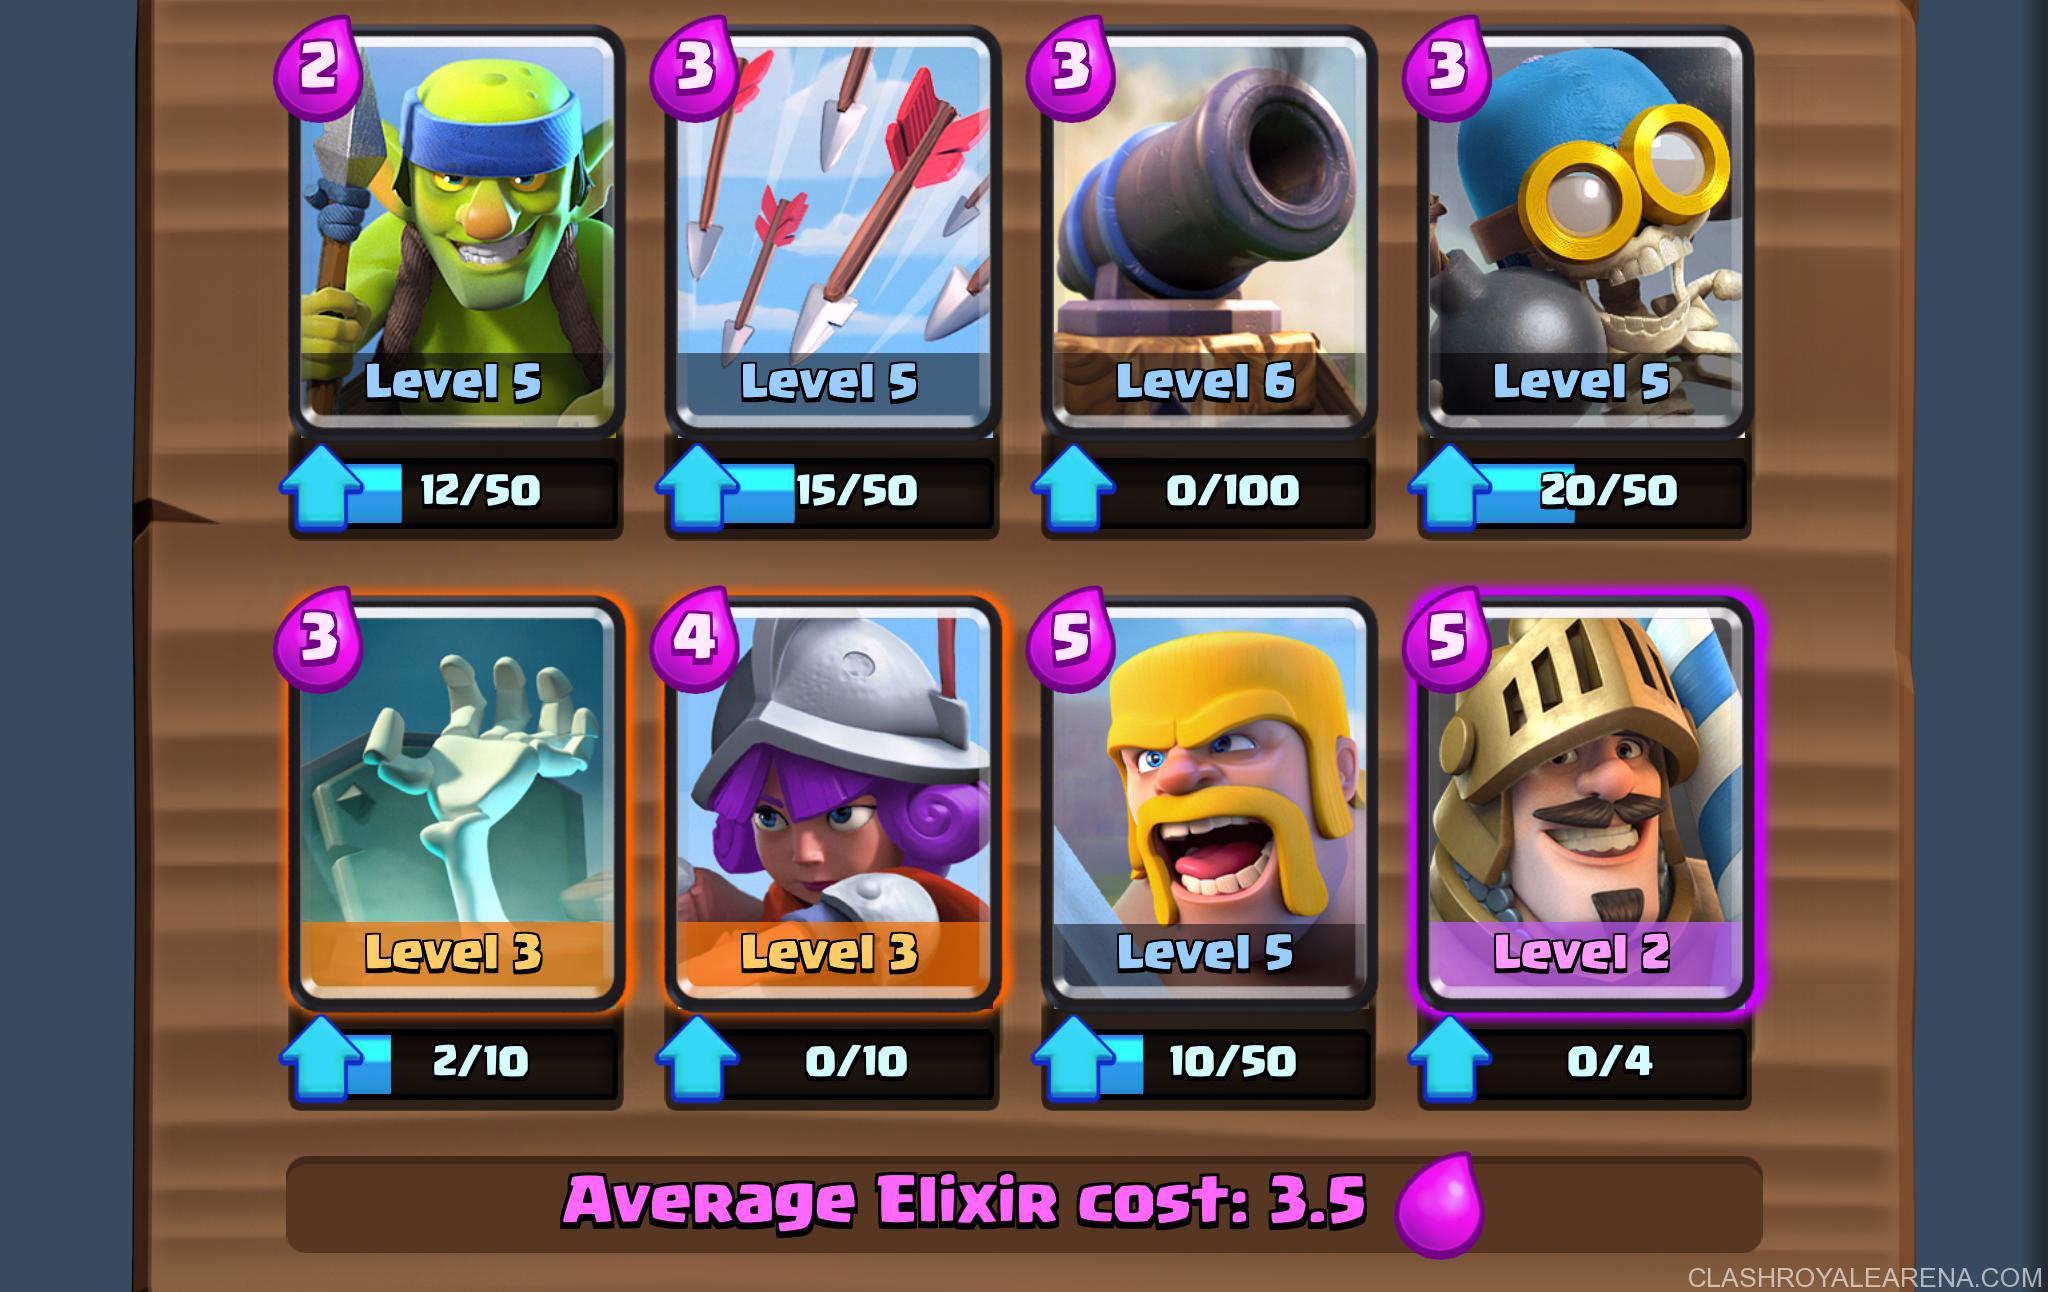 clash royale arena 5 deck guide